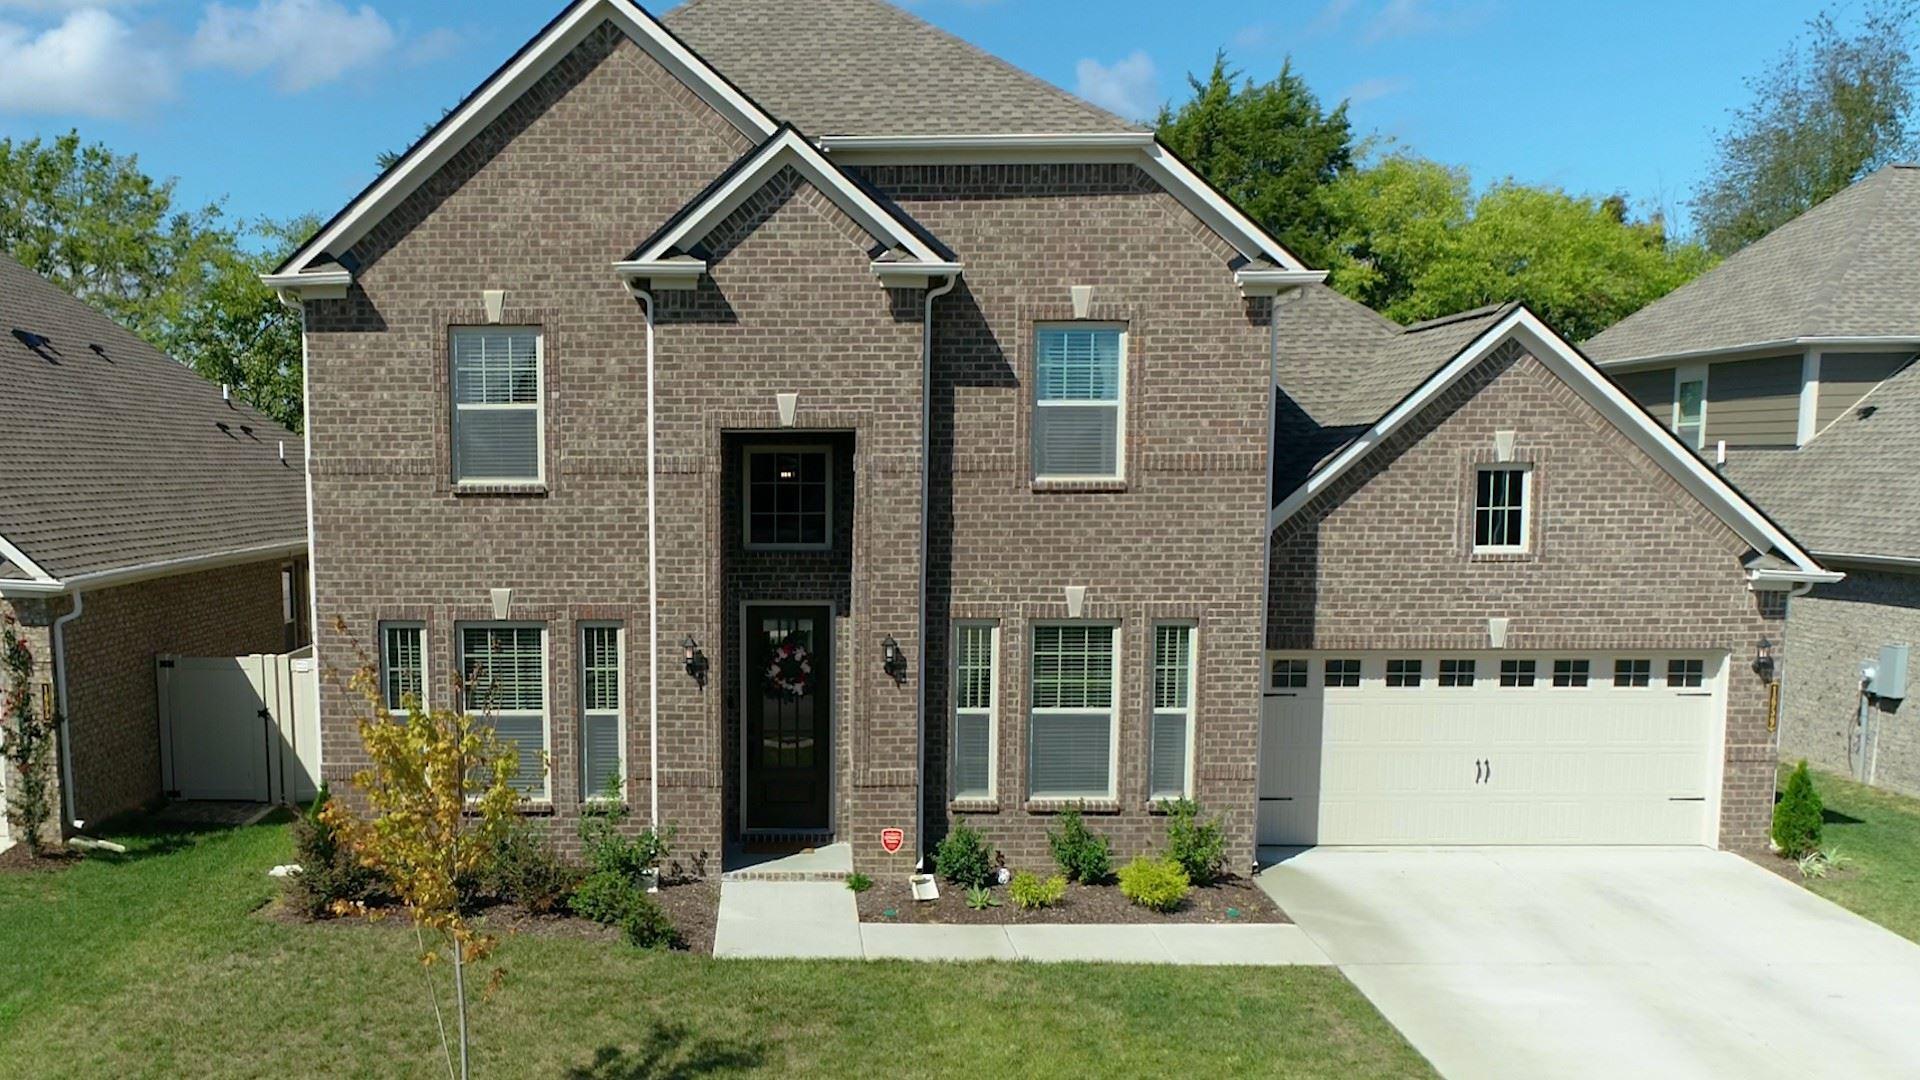 Photo of 1659 Burrows Ave, Murfreesboro, TN 37129 (MLS # 2291664)